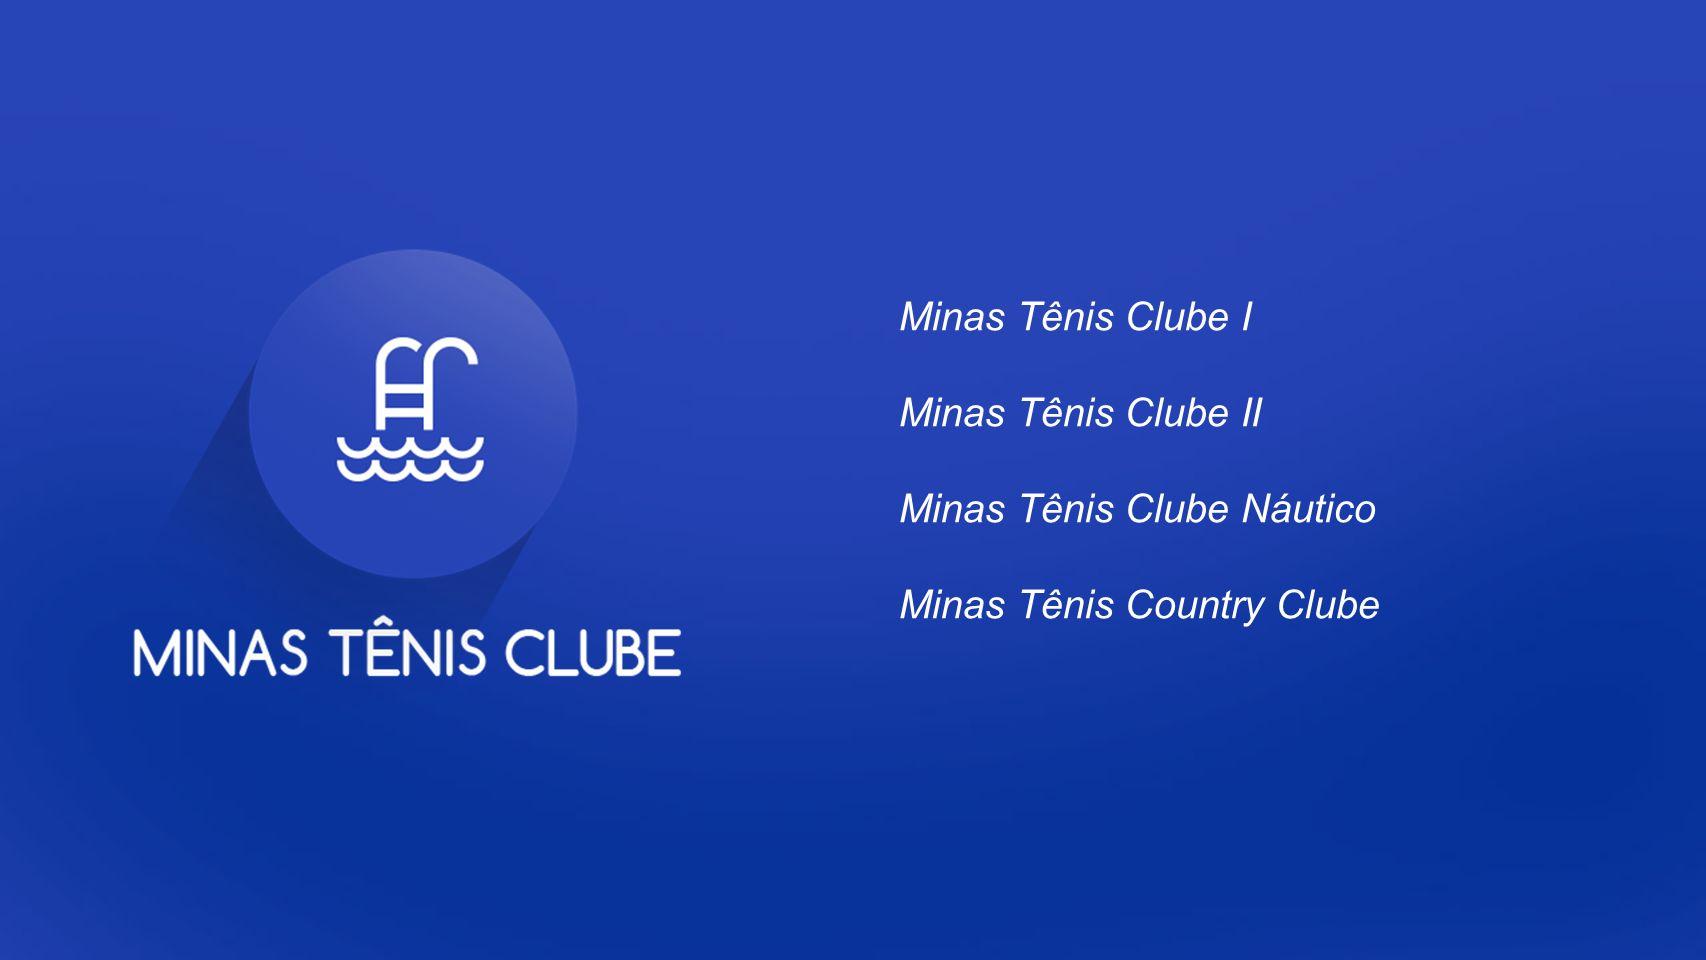 Minas Tênis Clube I Minas Tênis Clube II Minas Tênis Clube Náutico Minas Tênis Country Clube